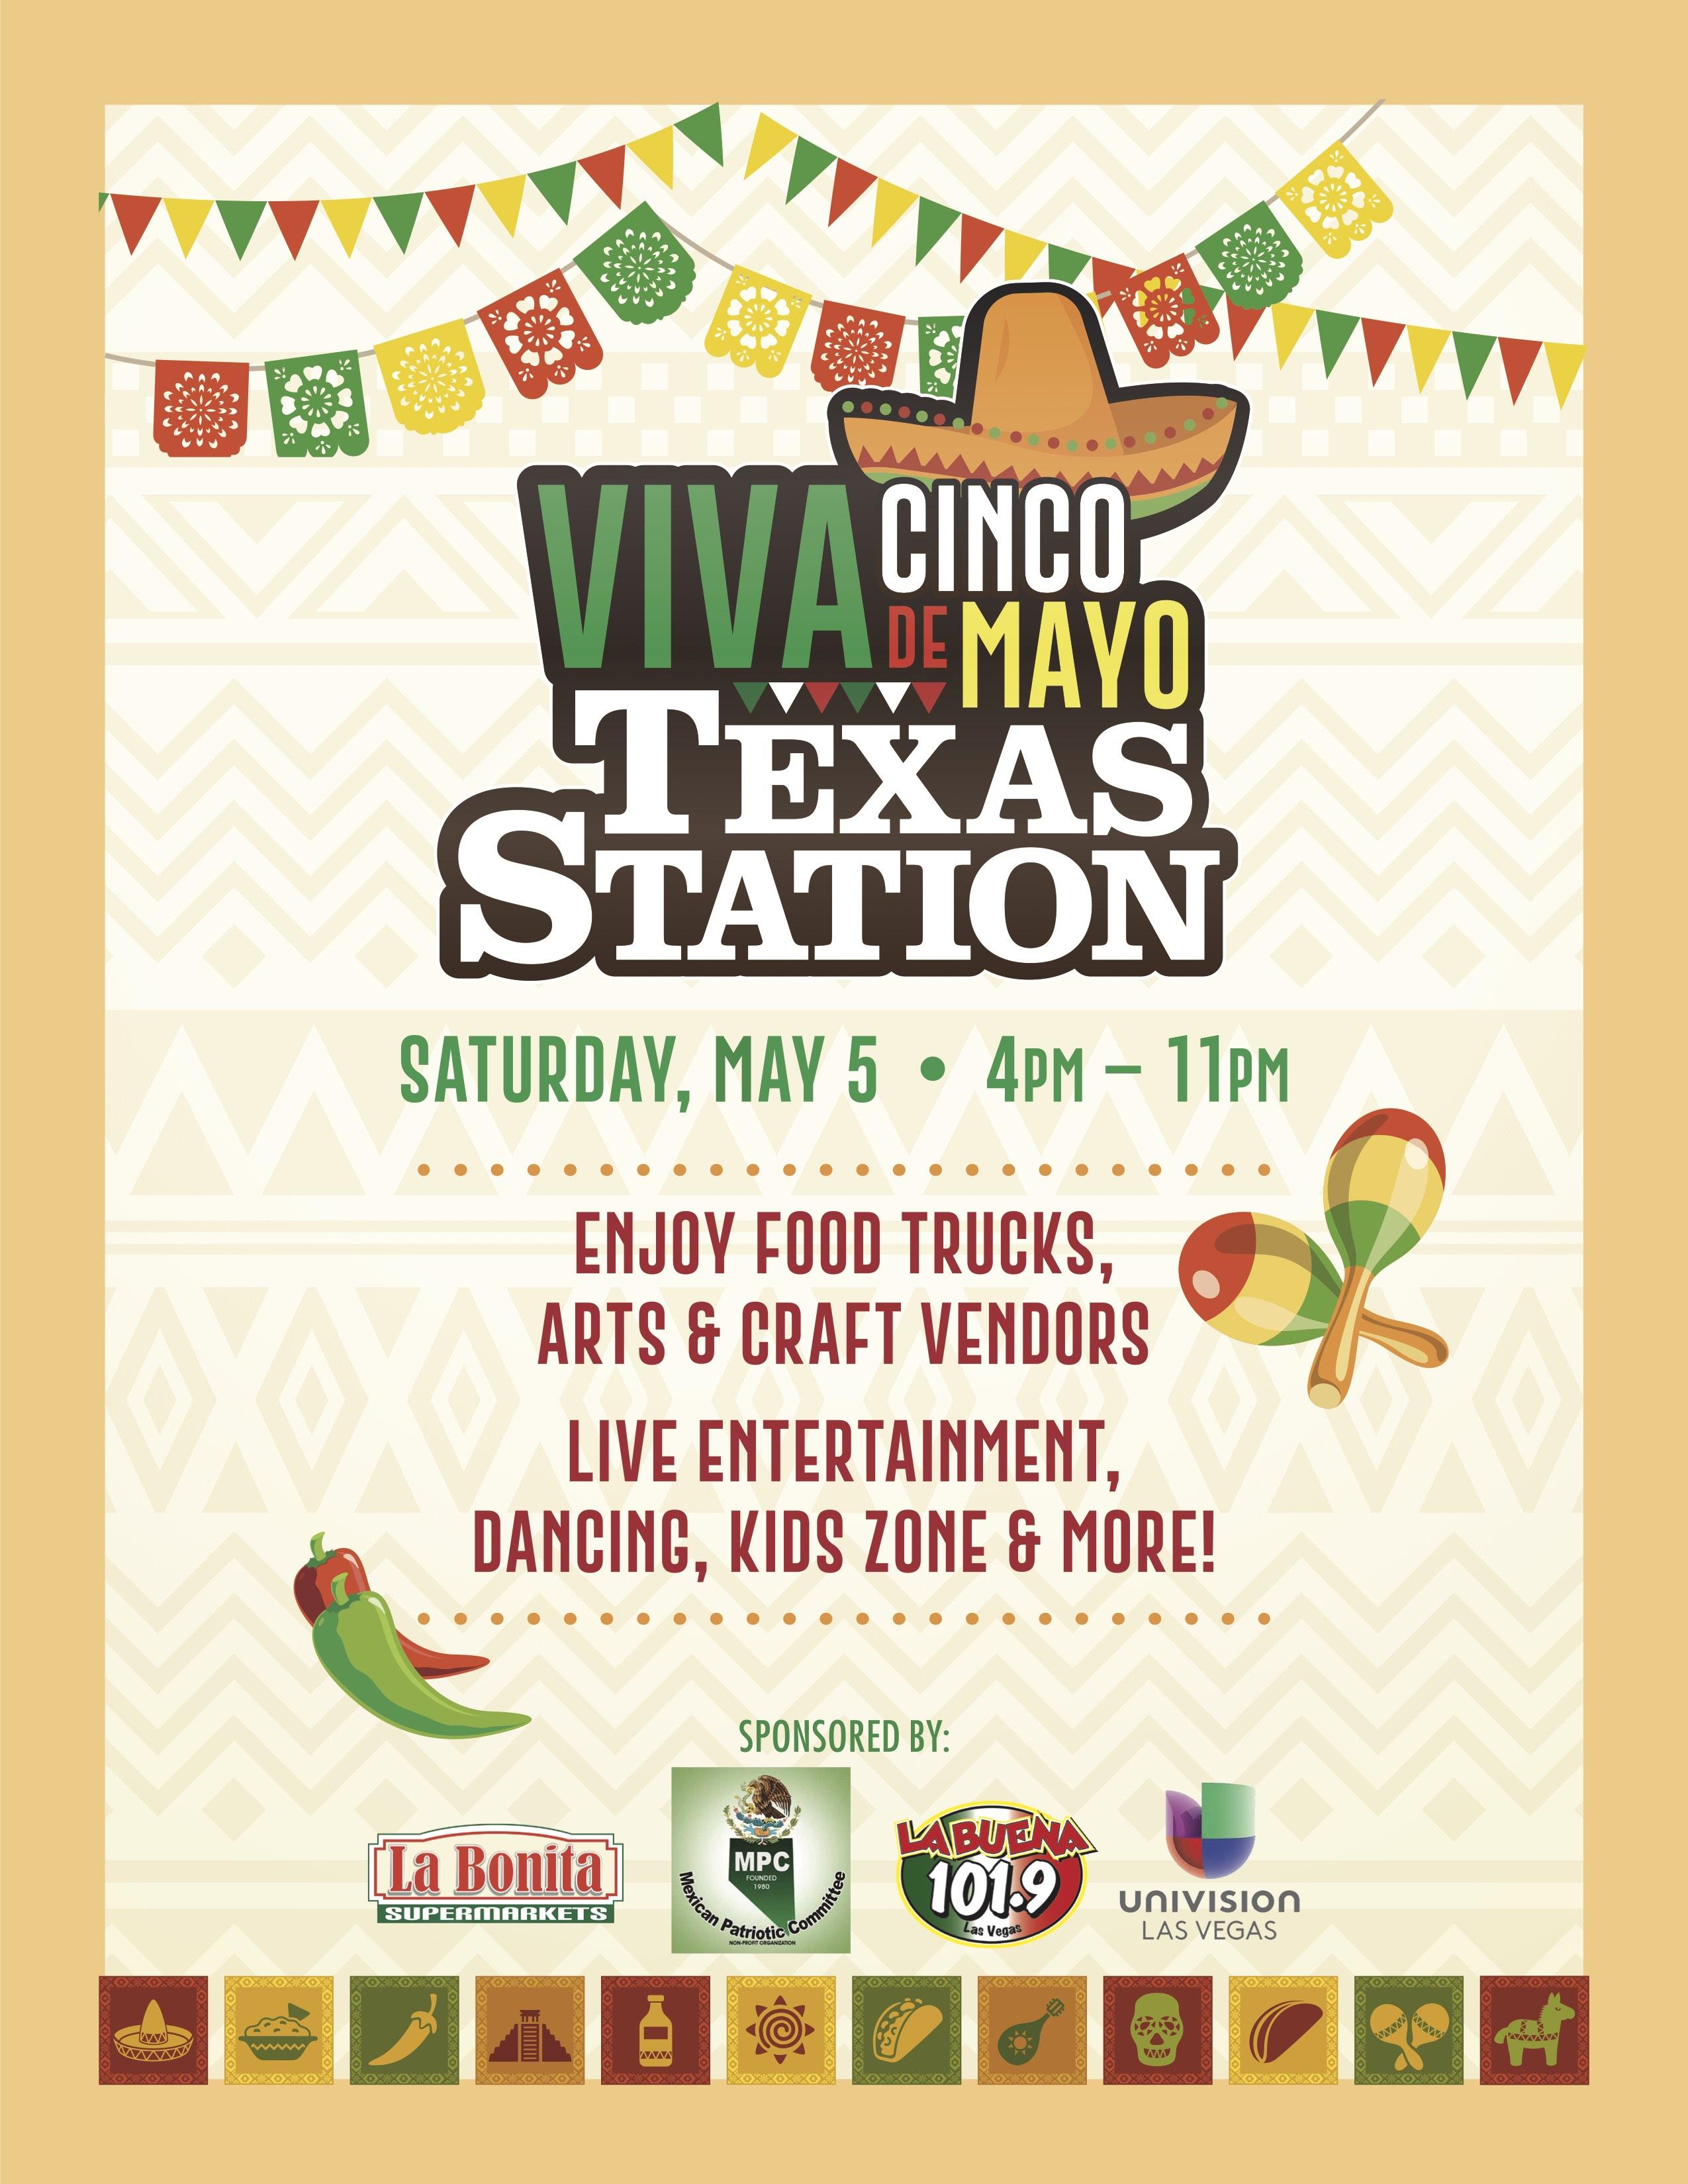 Texas Station Viva Cinco De Mayo La Buena 101 9